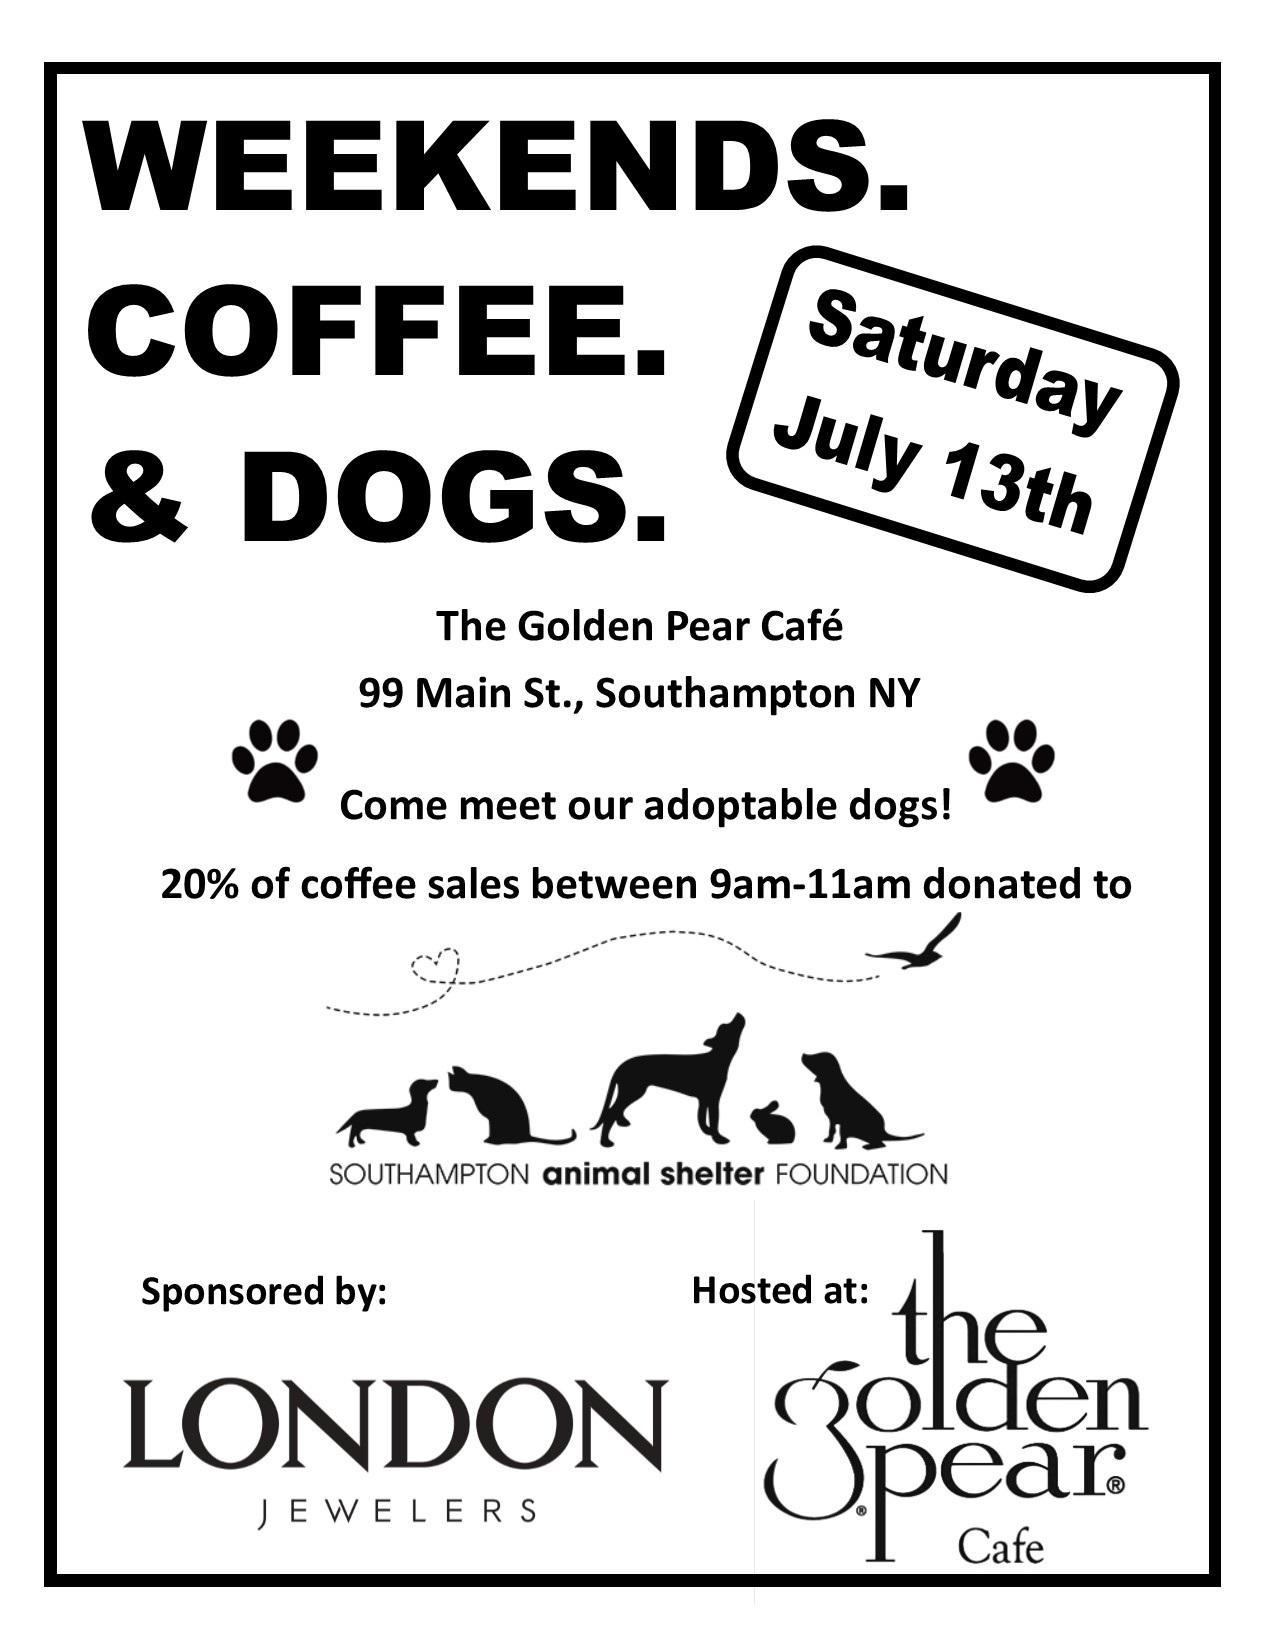 Weekends. Coffee. & Dogs.